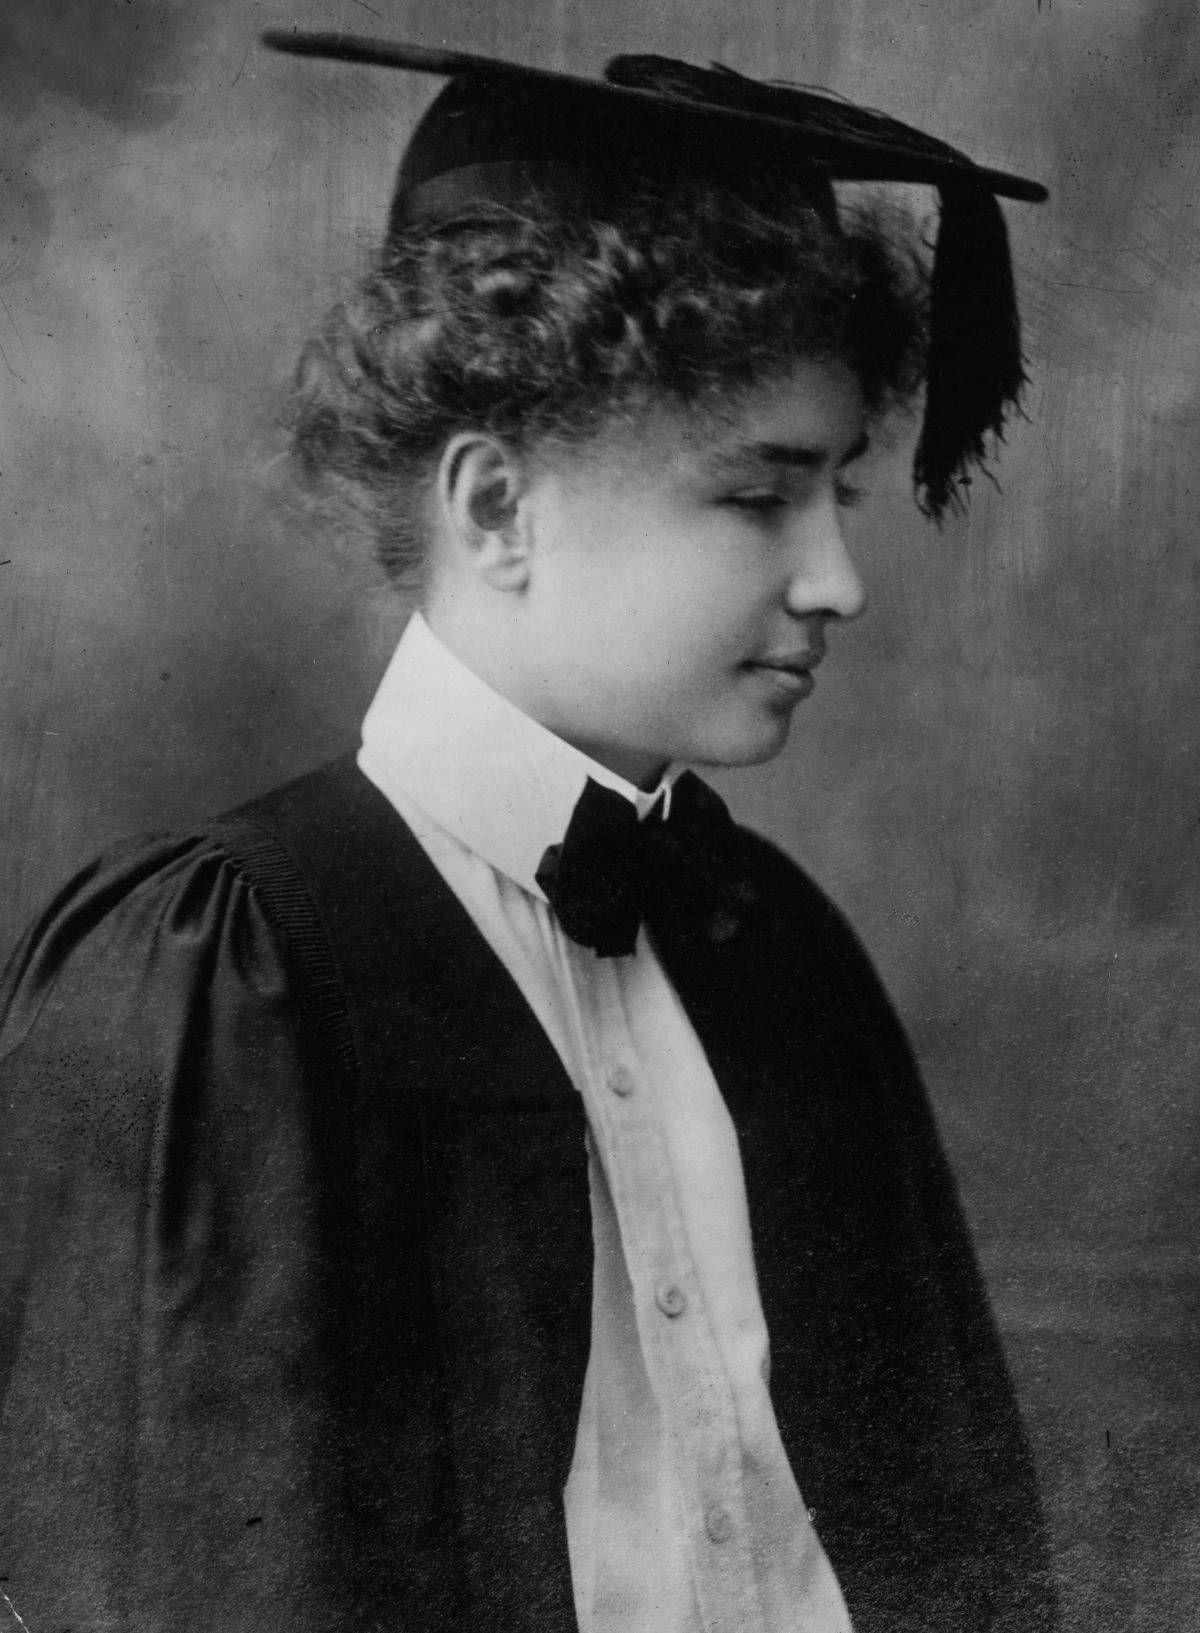 Helen Keller S Lineage With Images Helen Keller Women In